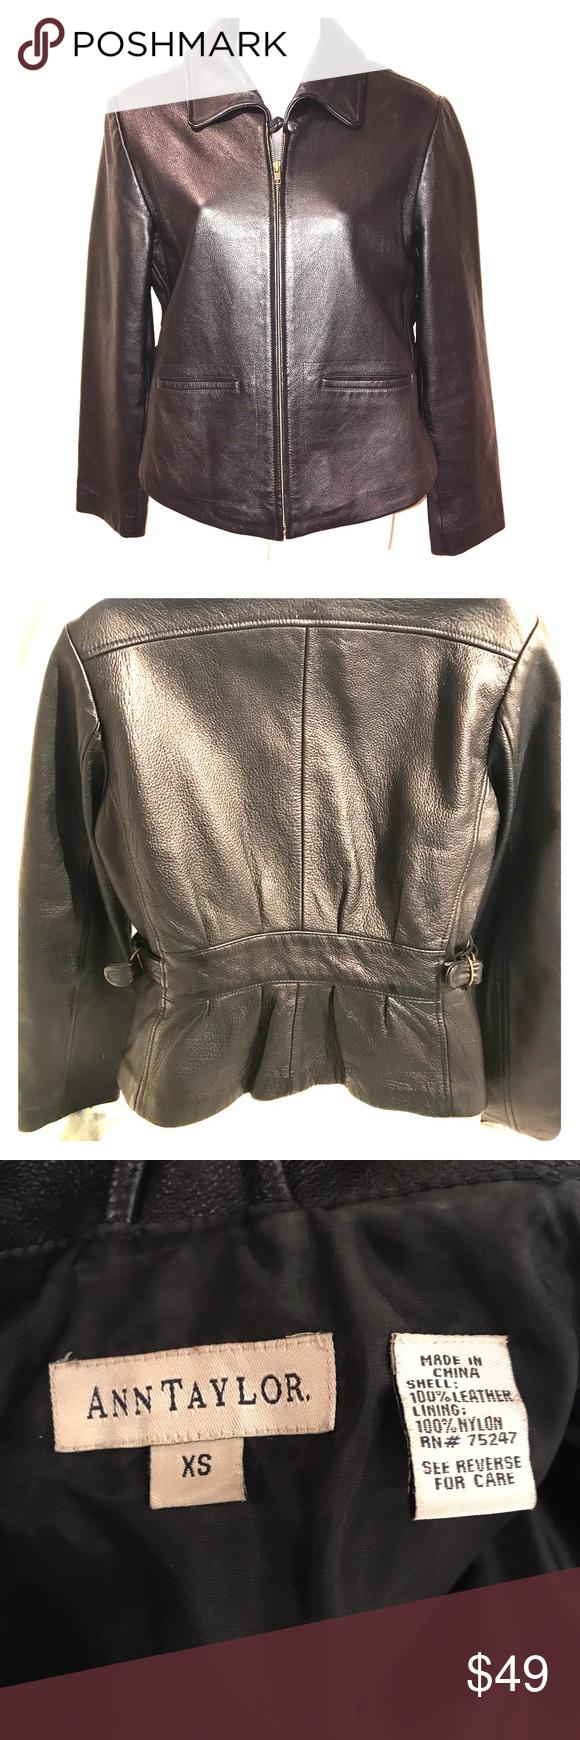 Leather jacket xs - Ann Taylor Leather Jacket Xs Classic Black Leather Jacket By Ann Taylor Lined Pockets